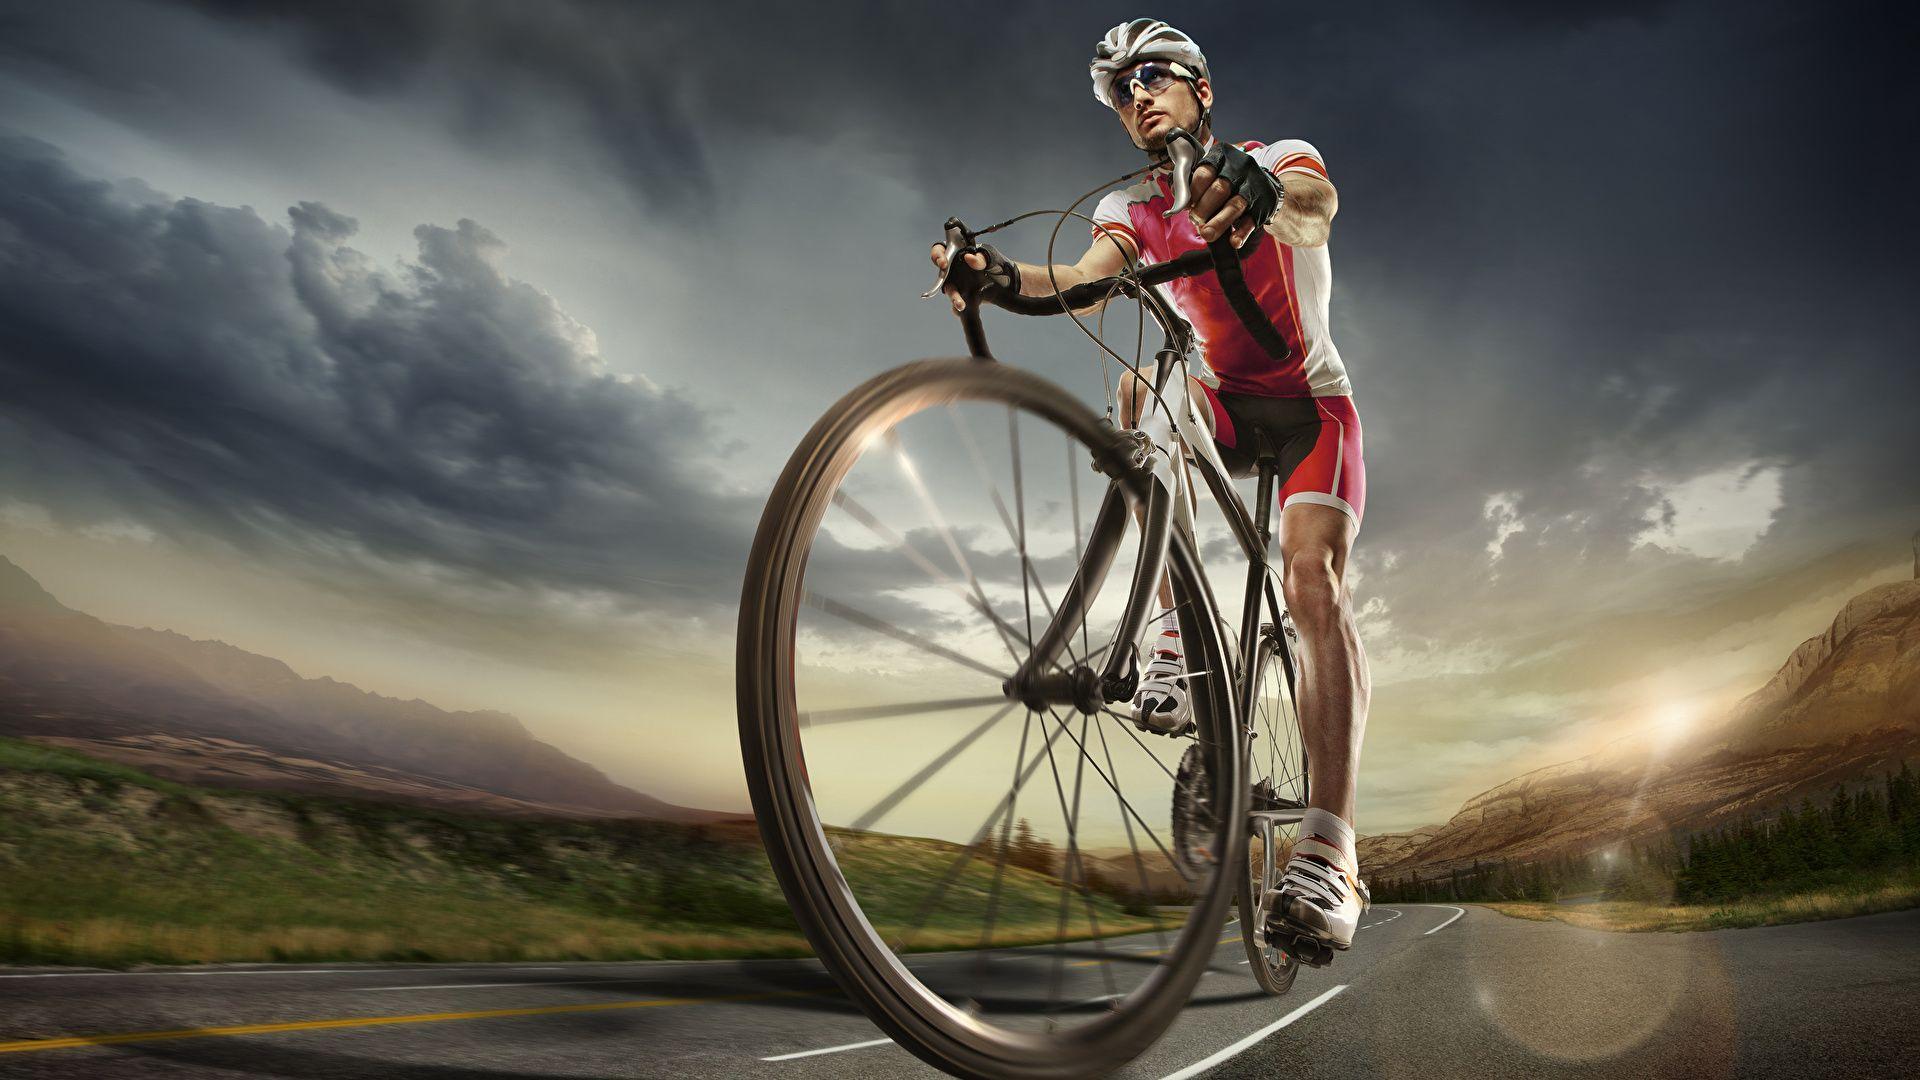 Cycling wallpaper photo full hd